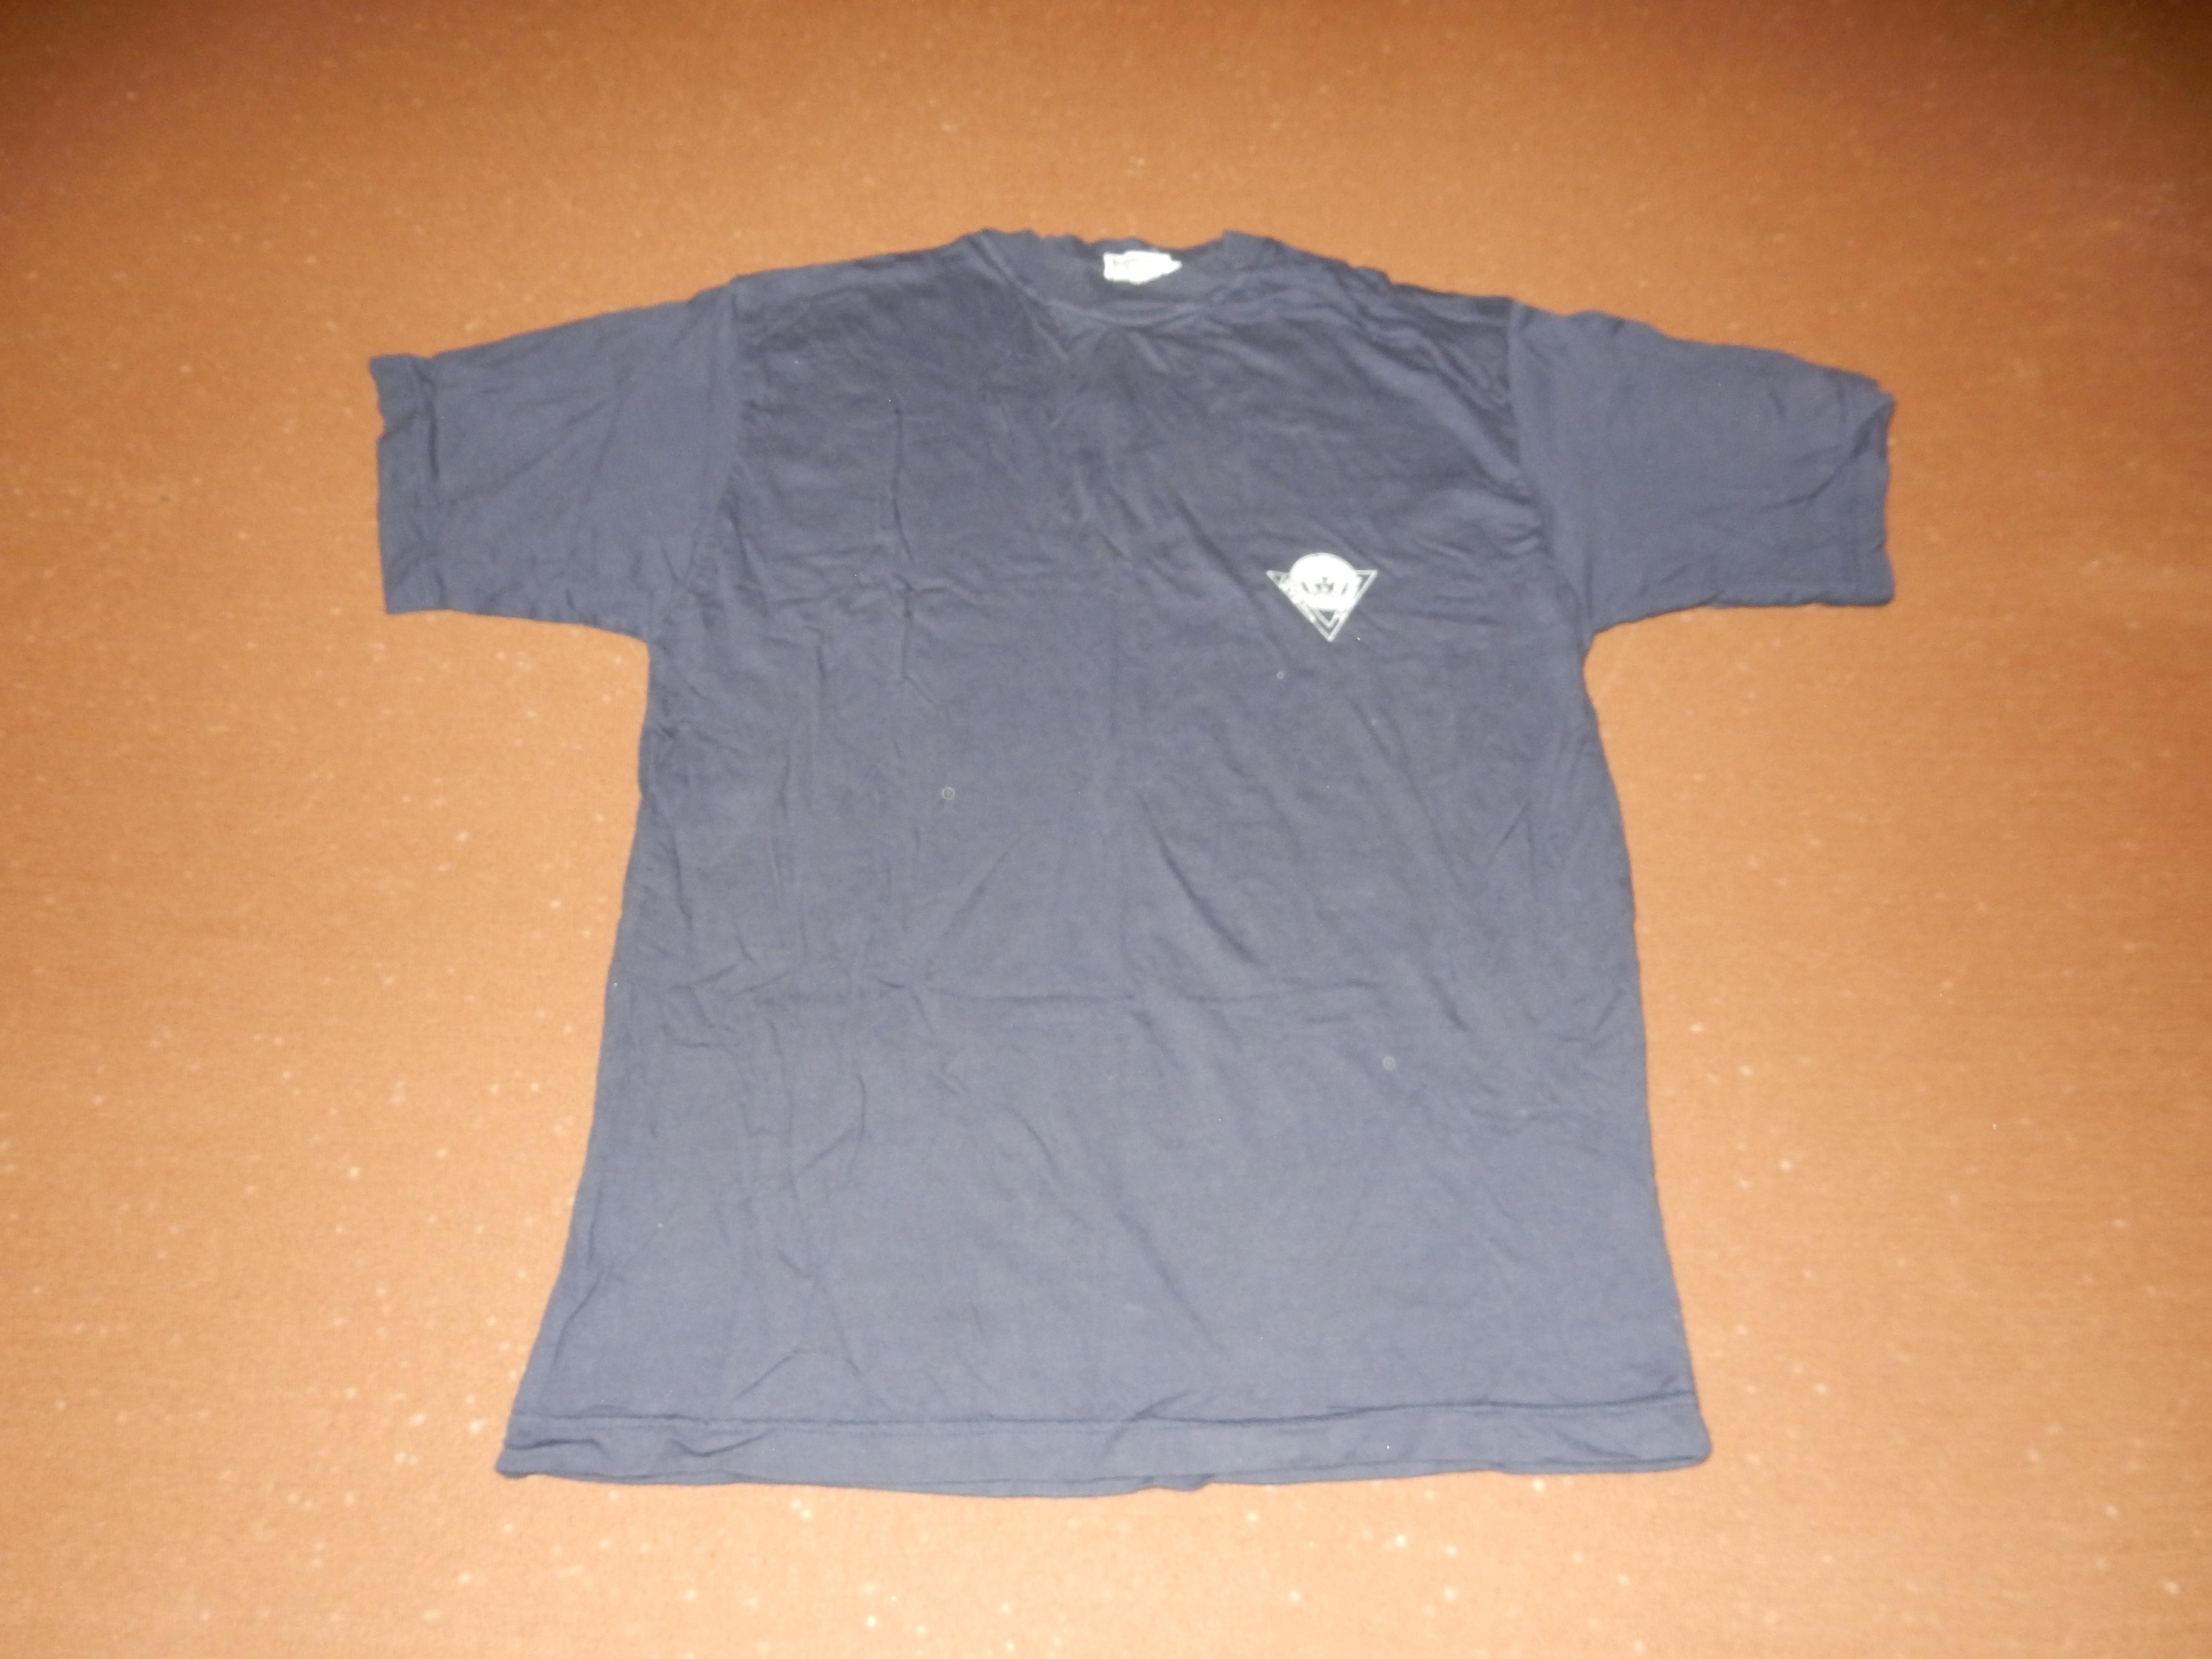 8bfe0ff0 Versace Vintage Versace Sport T-shirt | Grailed